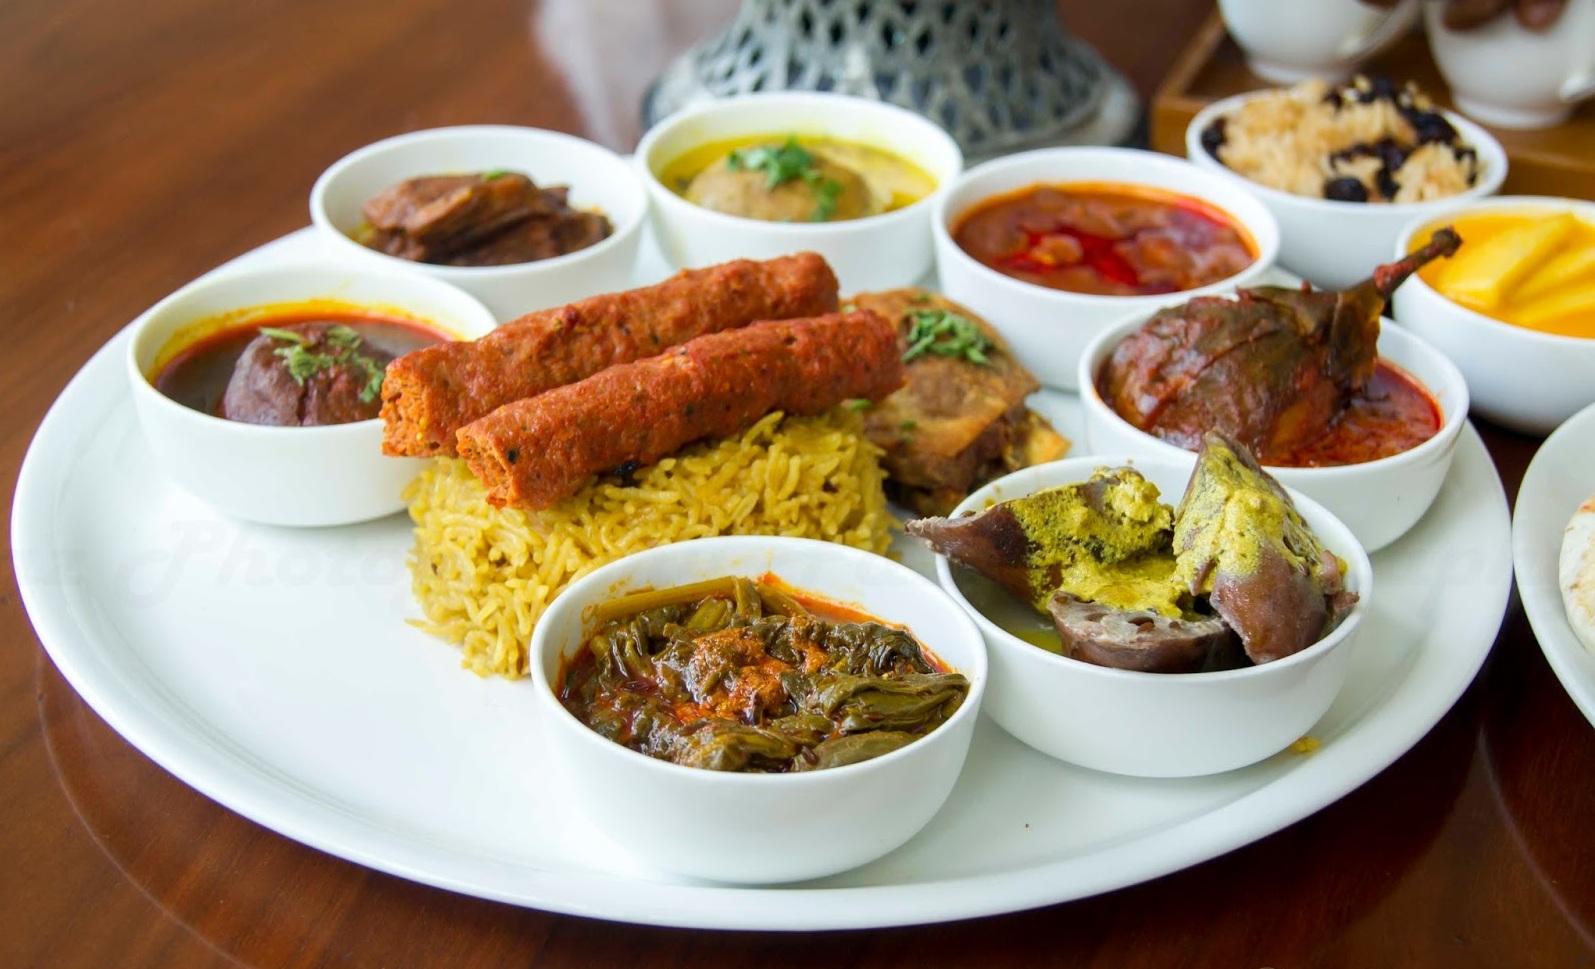 The ultimate Wazwan meals in a Traem